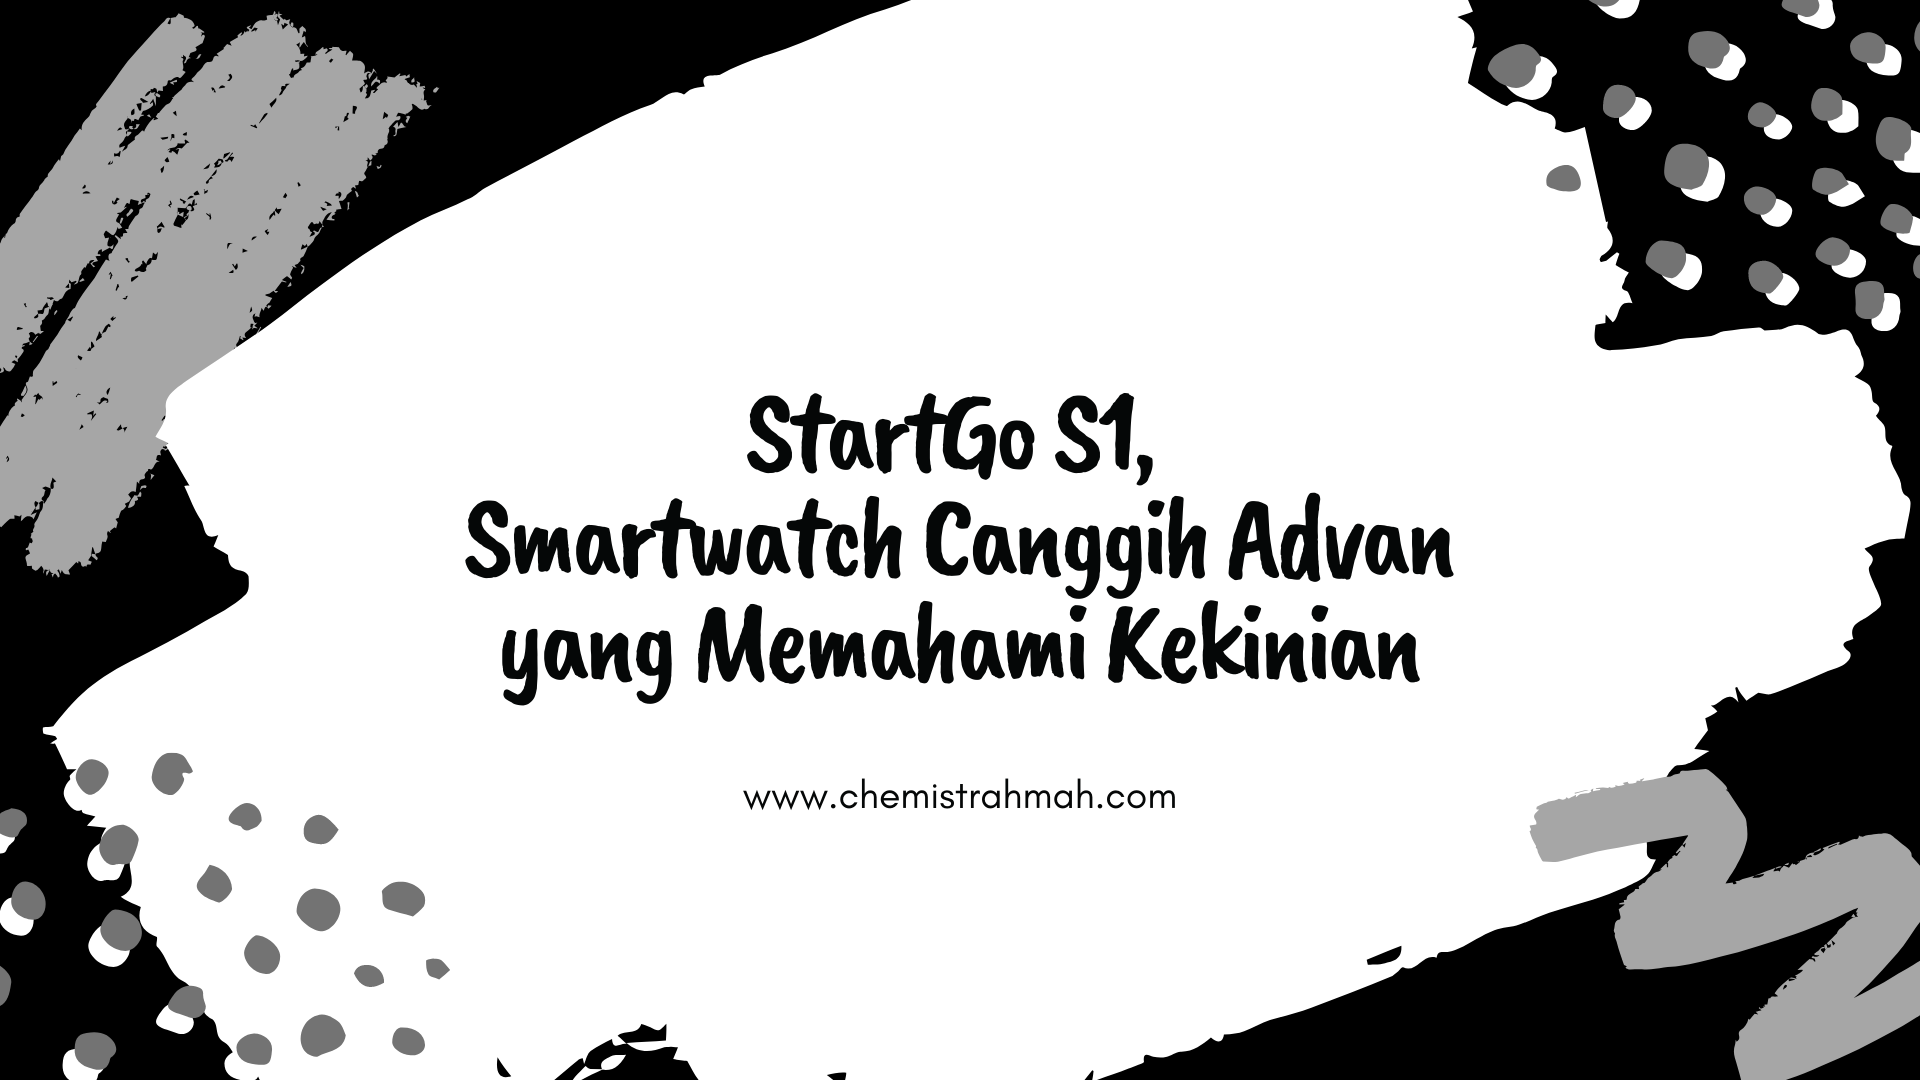 startgo s1 smartwatch advan